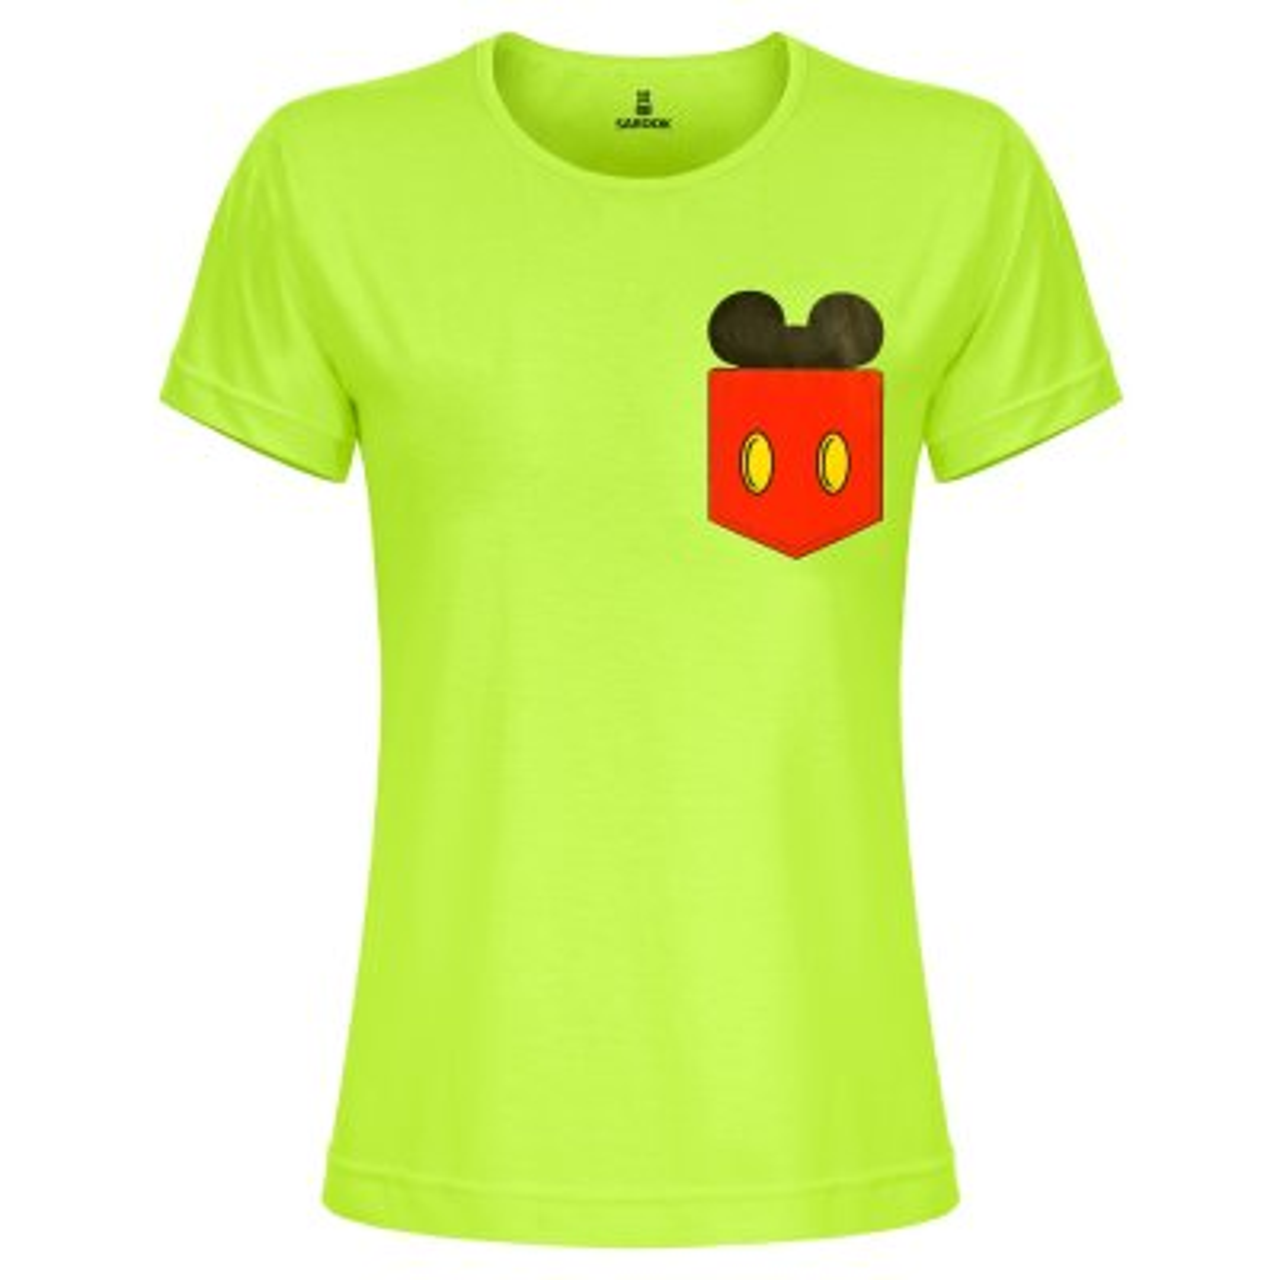 تی شرت زنانه ساروک مدل TZYUYRCH-Mickey 01 رنگ فسفری